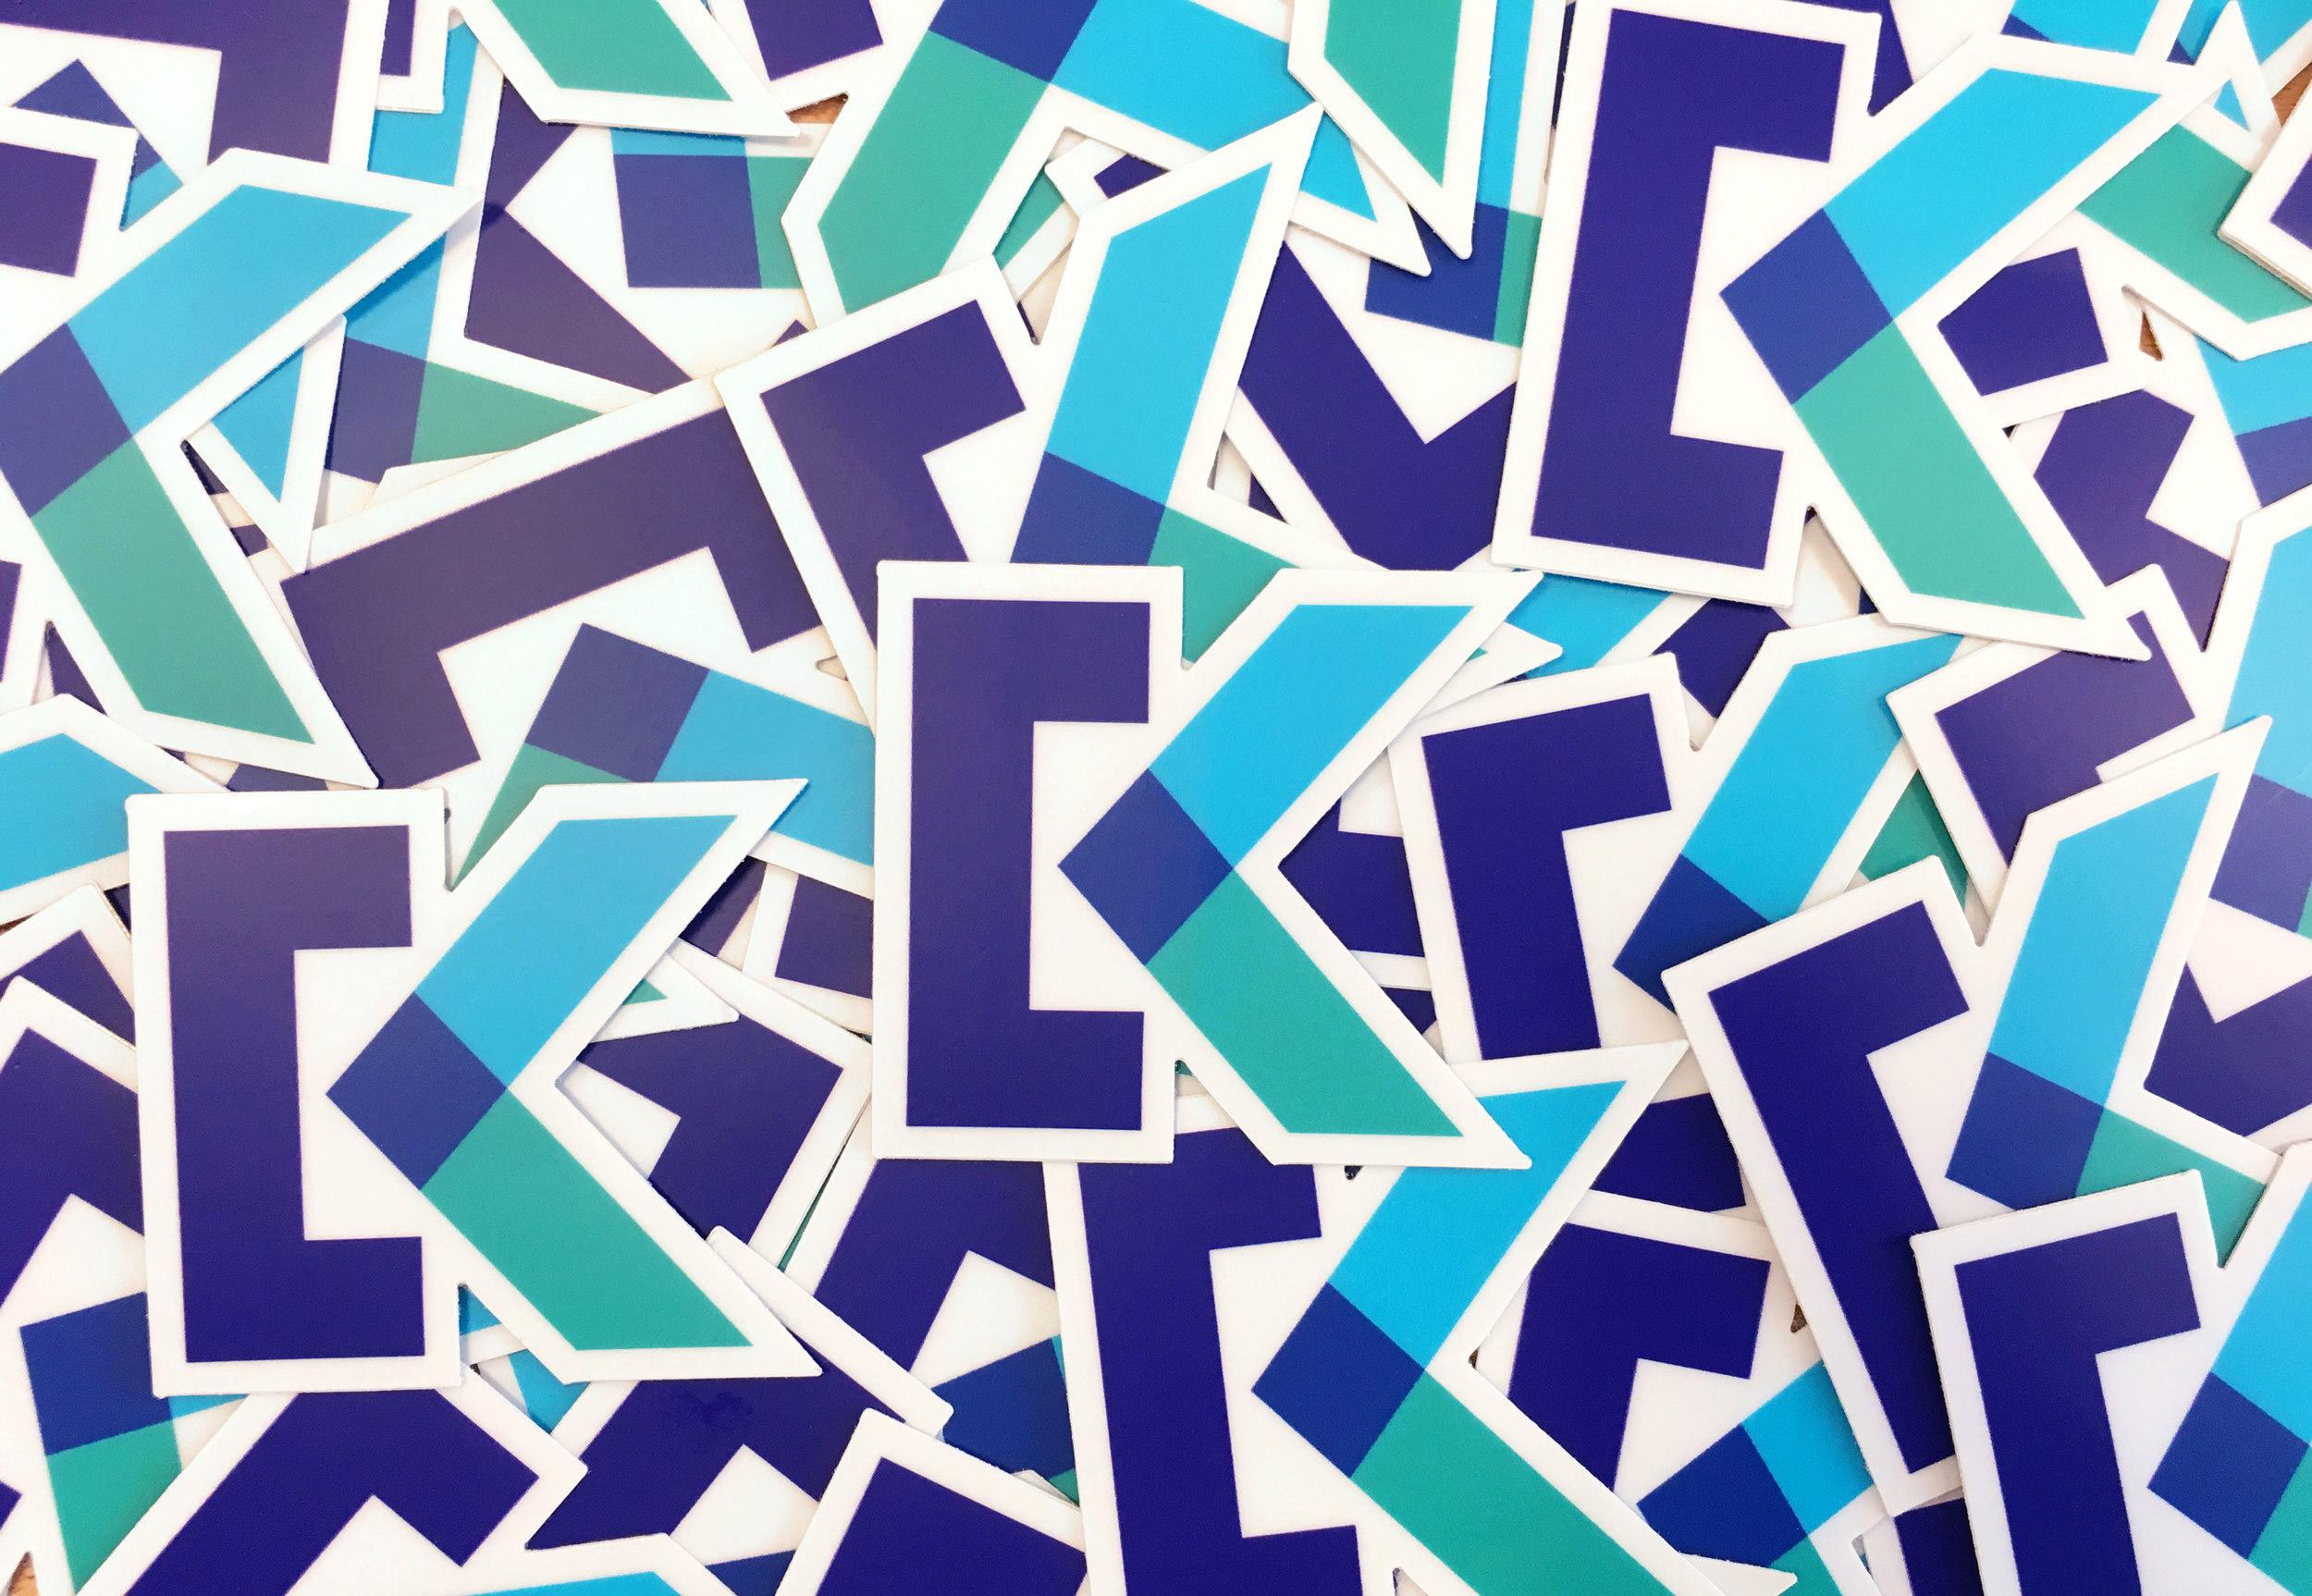 Anagraph-Keepsafe-Stickers2.jpg